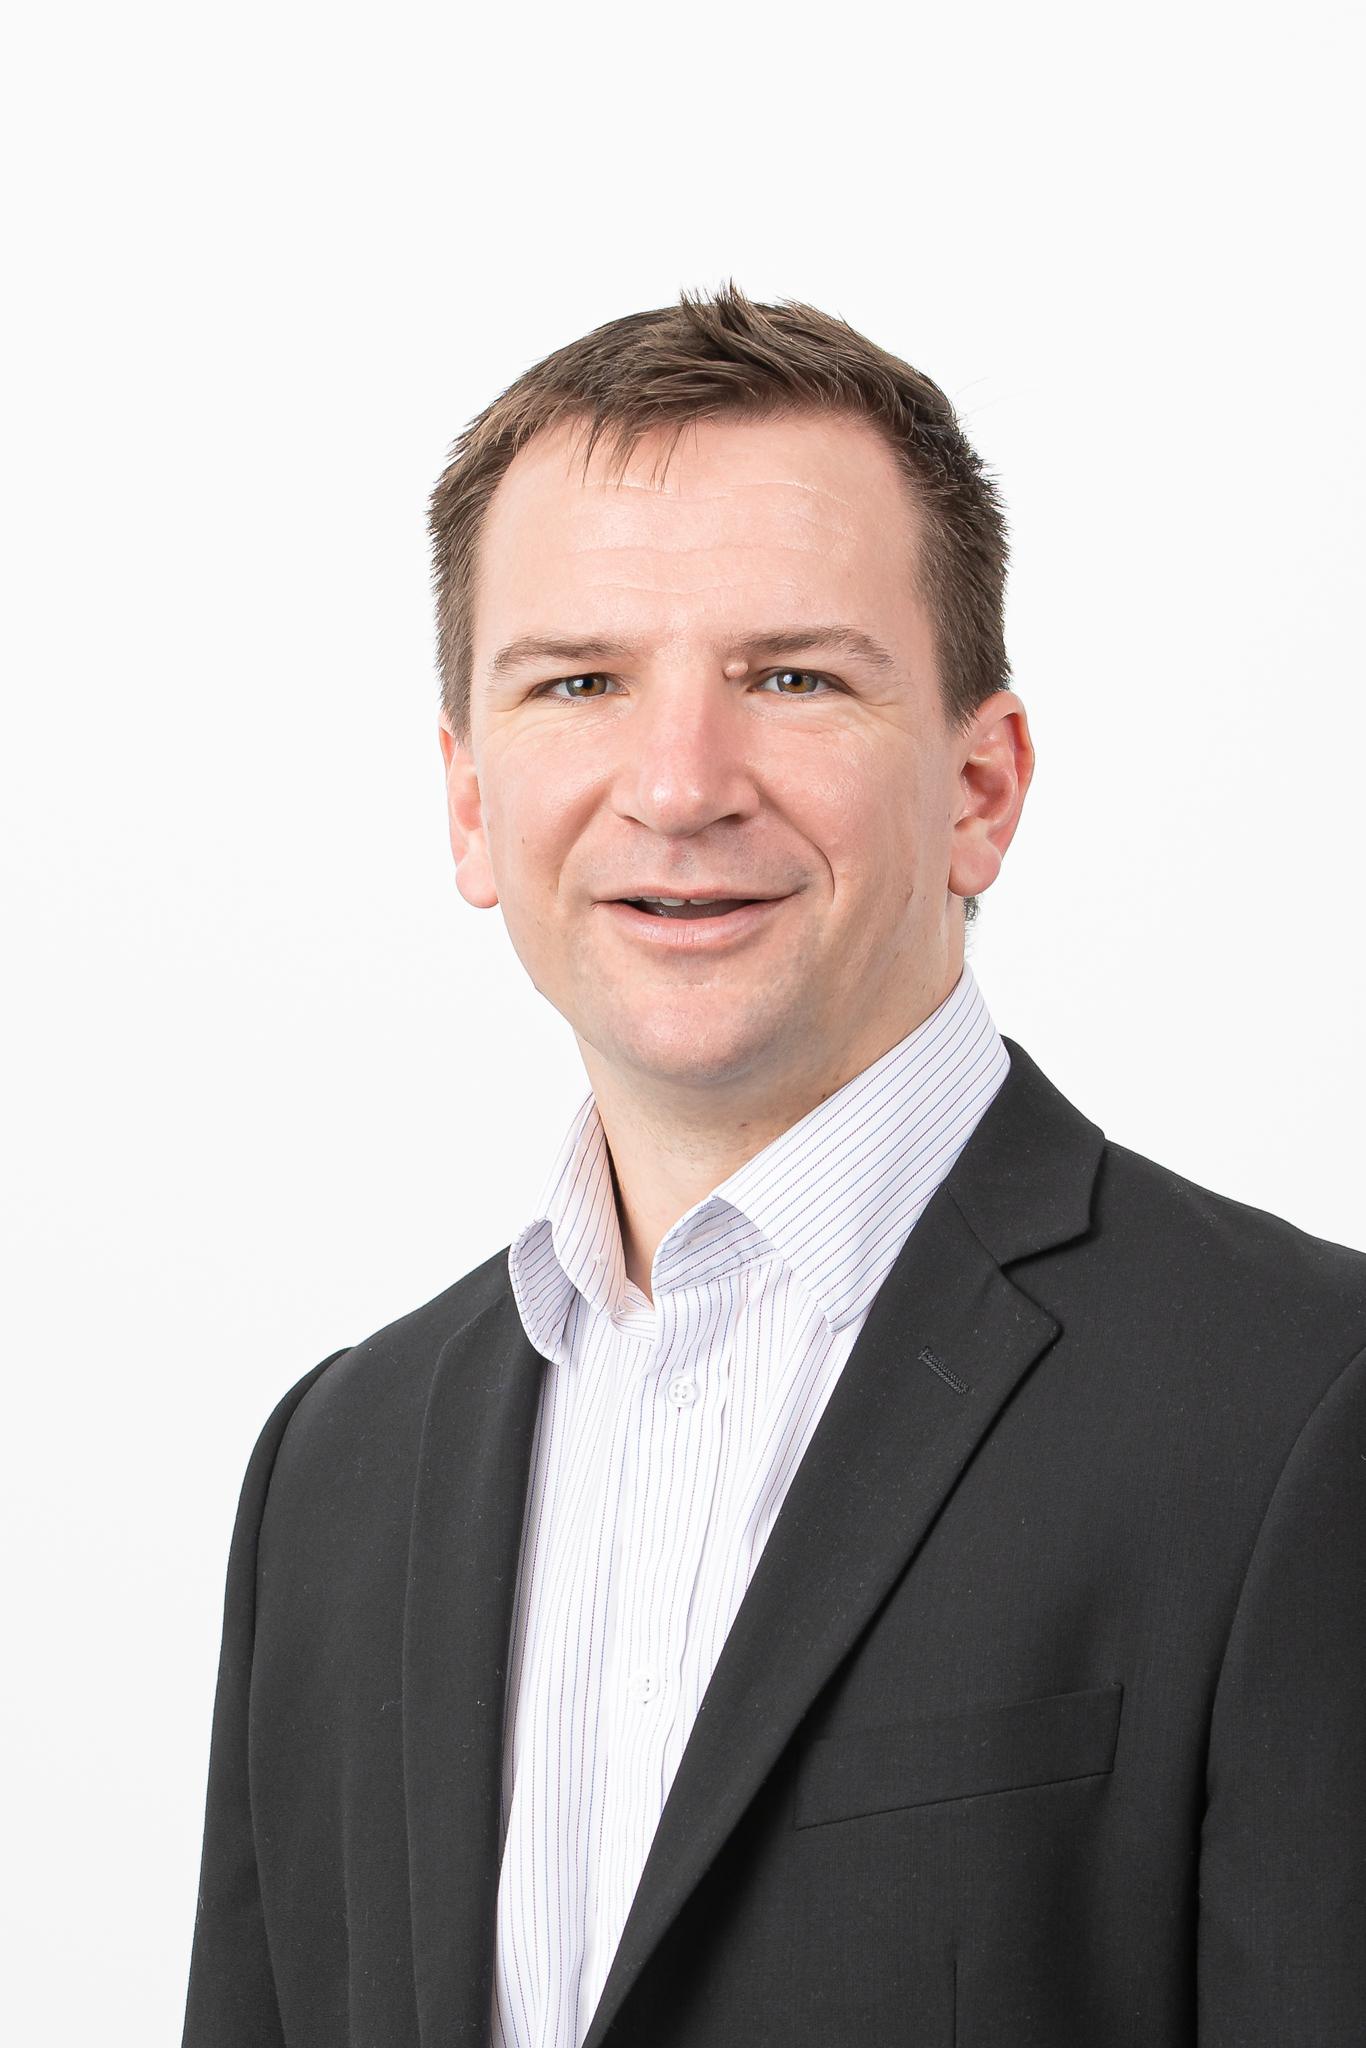 Tim Easton is Whanganui & Partners new Strategic Lead – Business